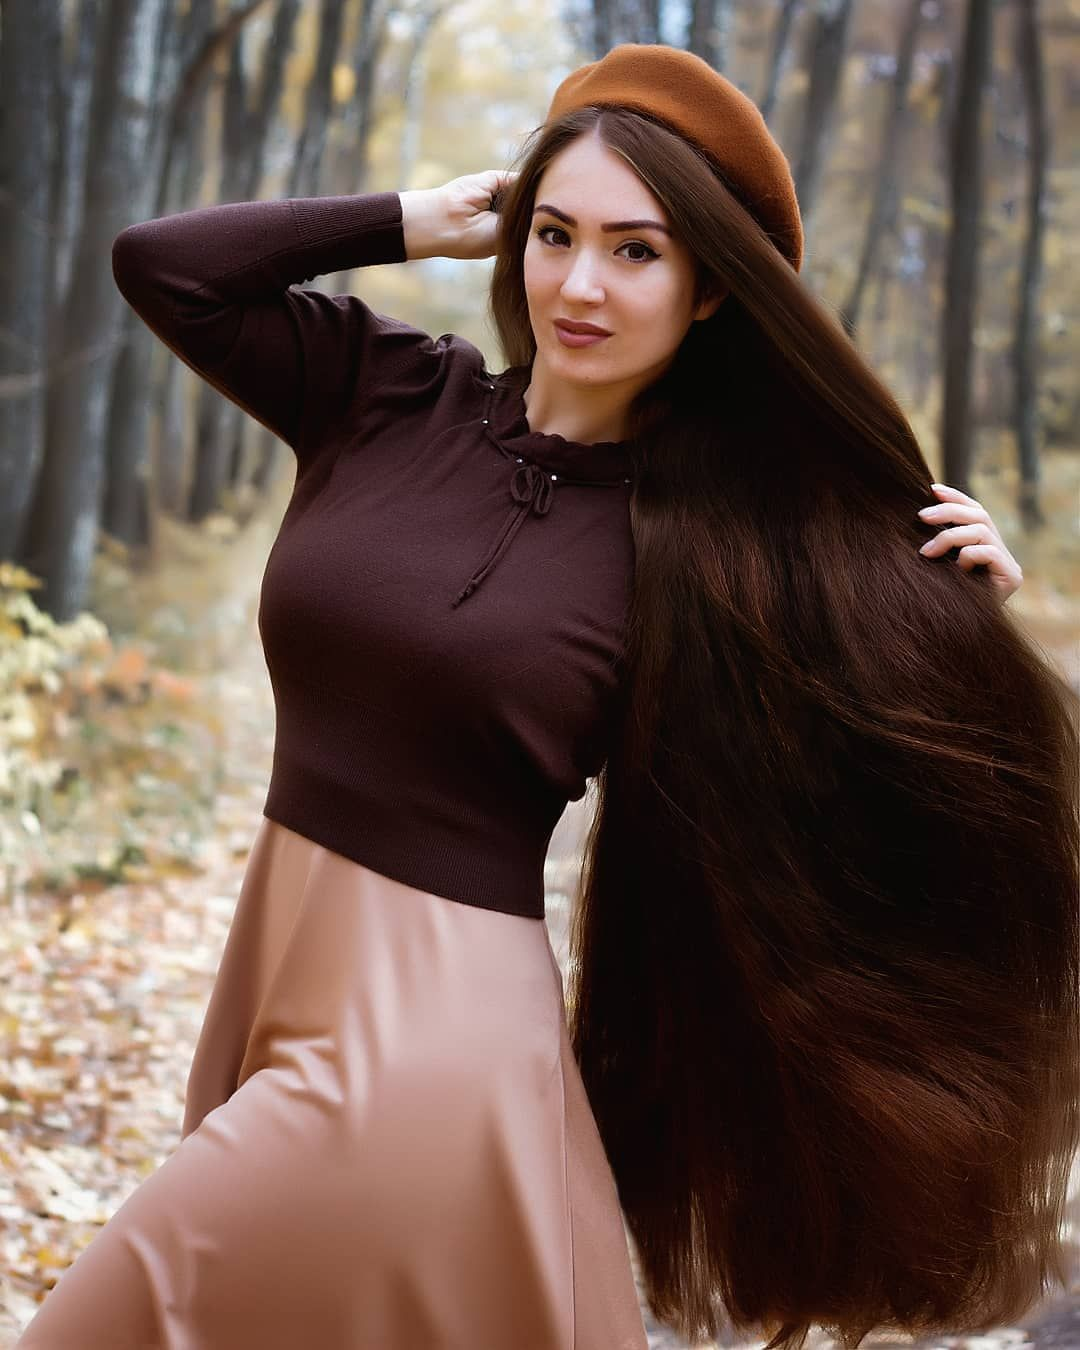 396 Kedveles 8 Hozzaszolas Long Hair Amazing Longhairamazing Instagram Hozzaszolasa Elena Of Hair In 2020 Extremely Long Hair Long Hair Women Long Thick Hair